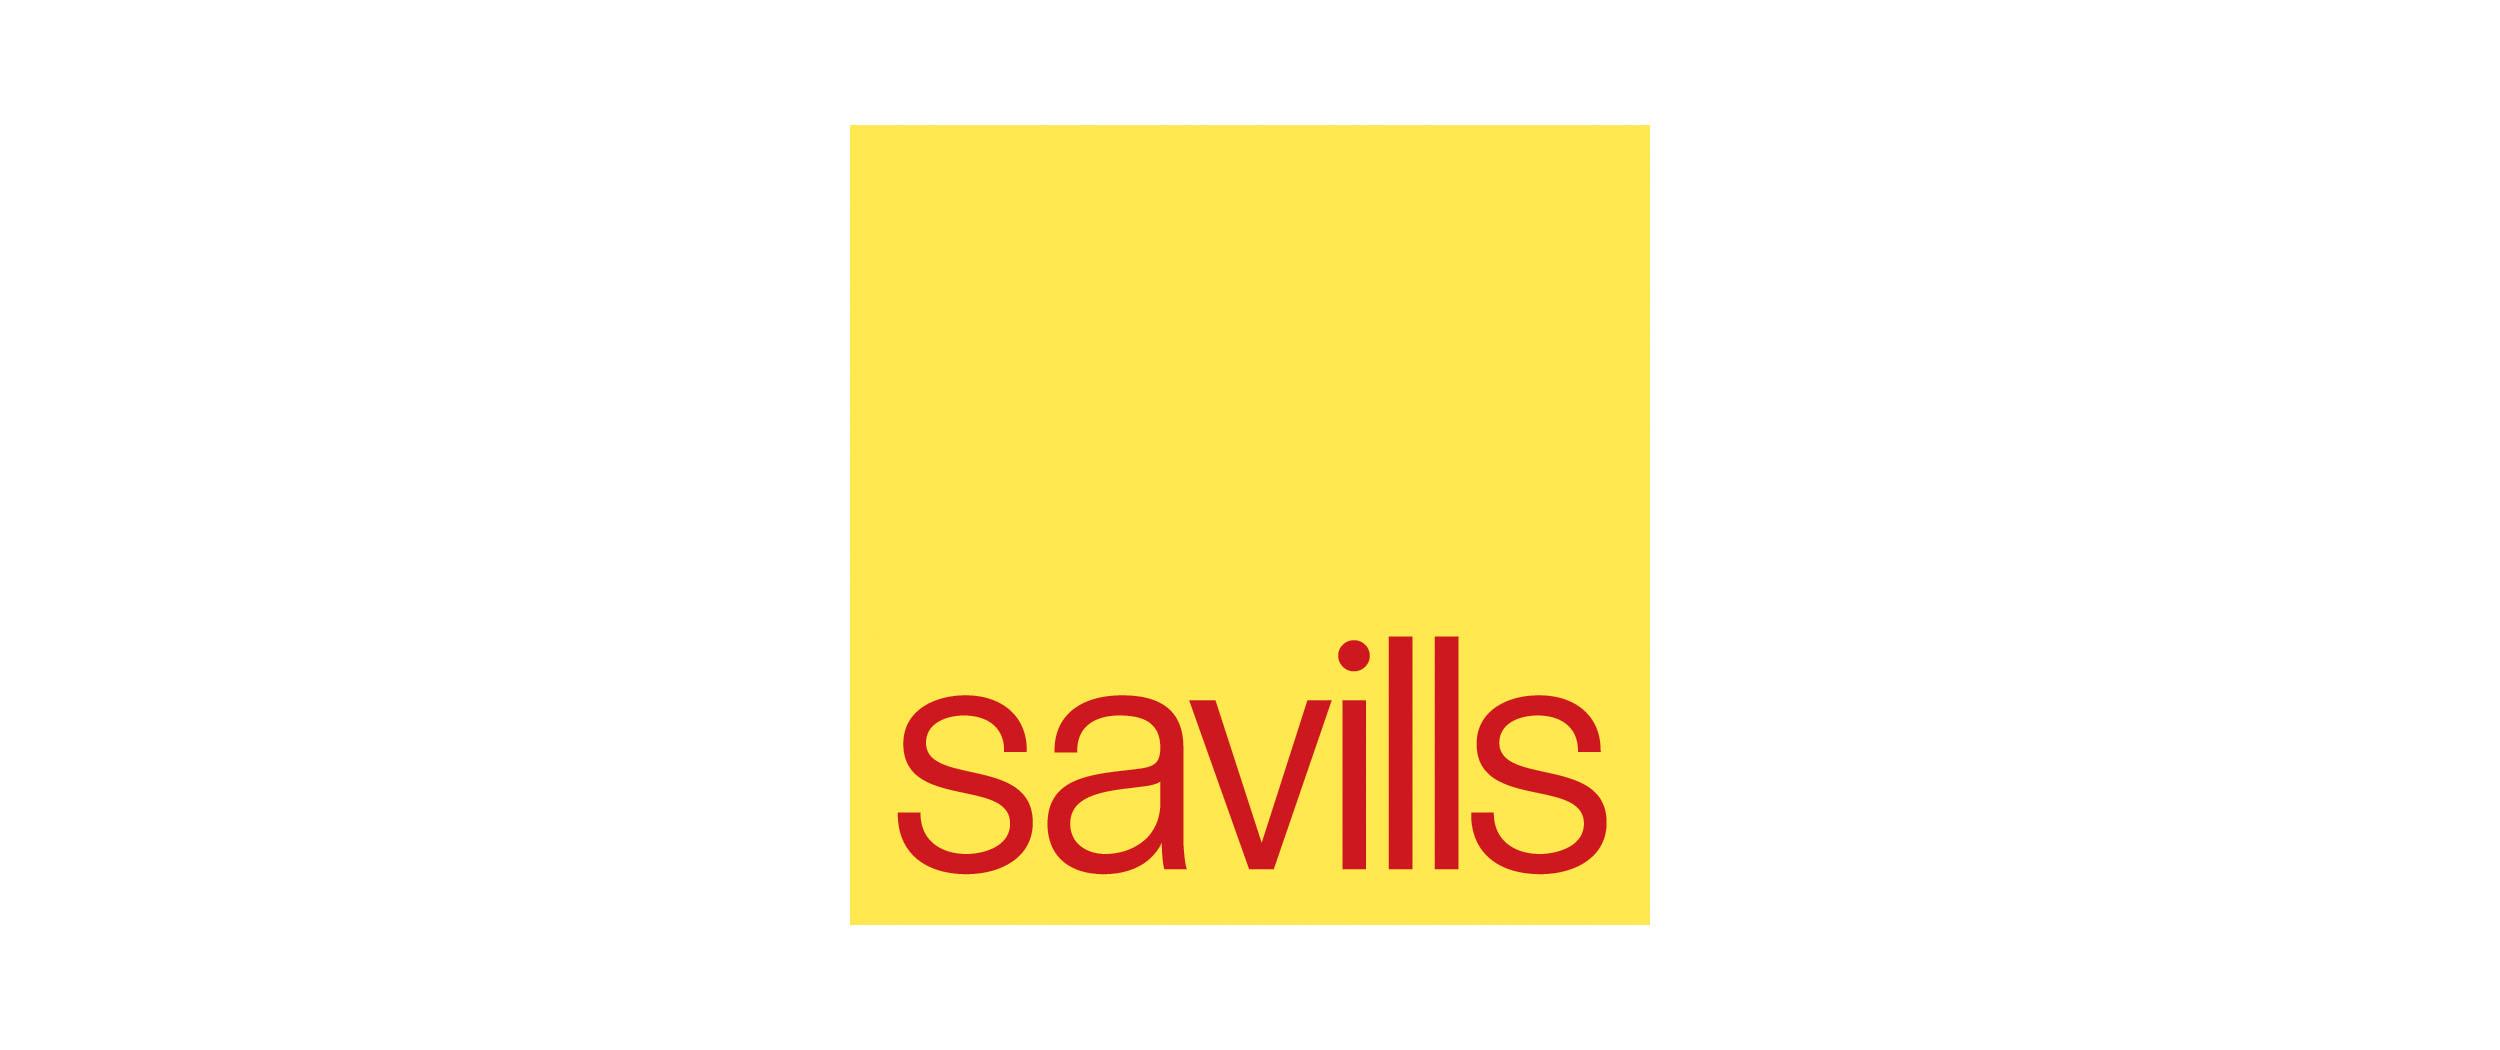 Savills copy.jpg